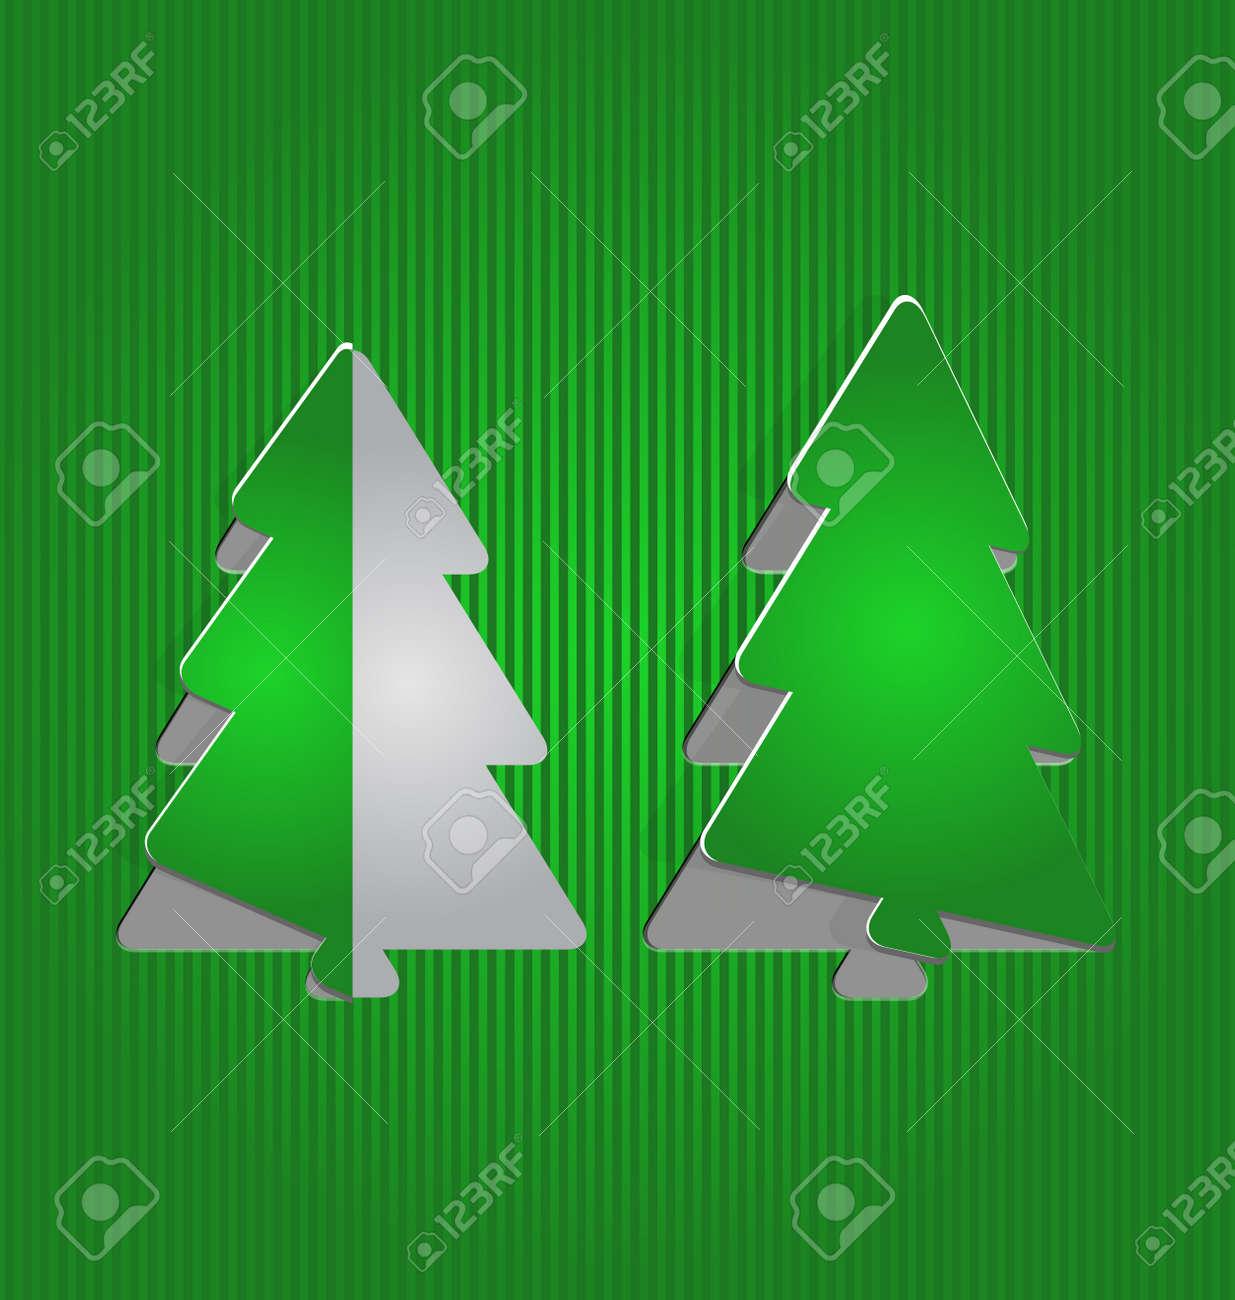 Illustration Christmas cutout paper tree, minimal background - vector Stock Vector - 24211532